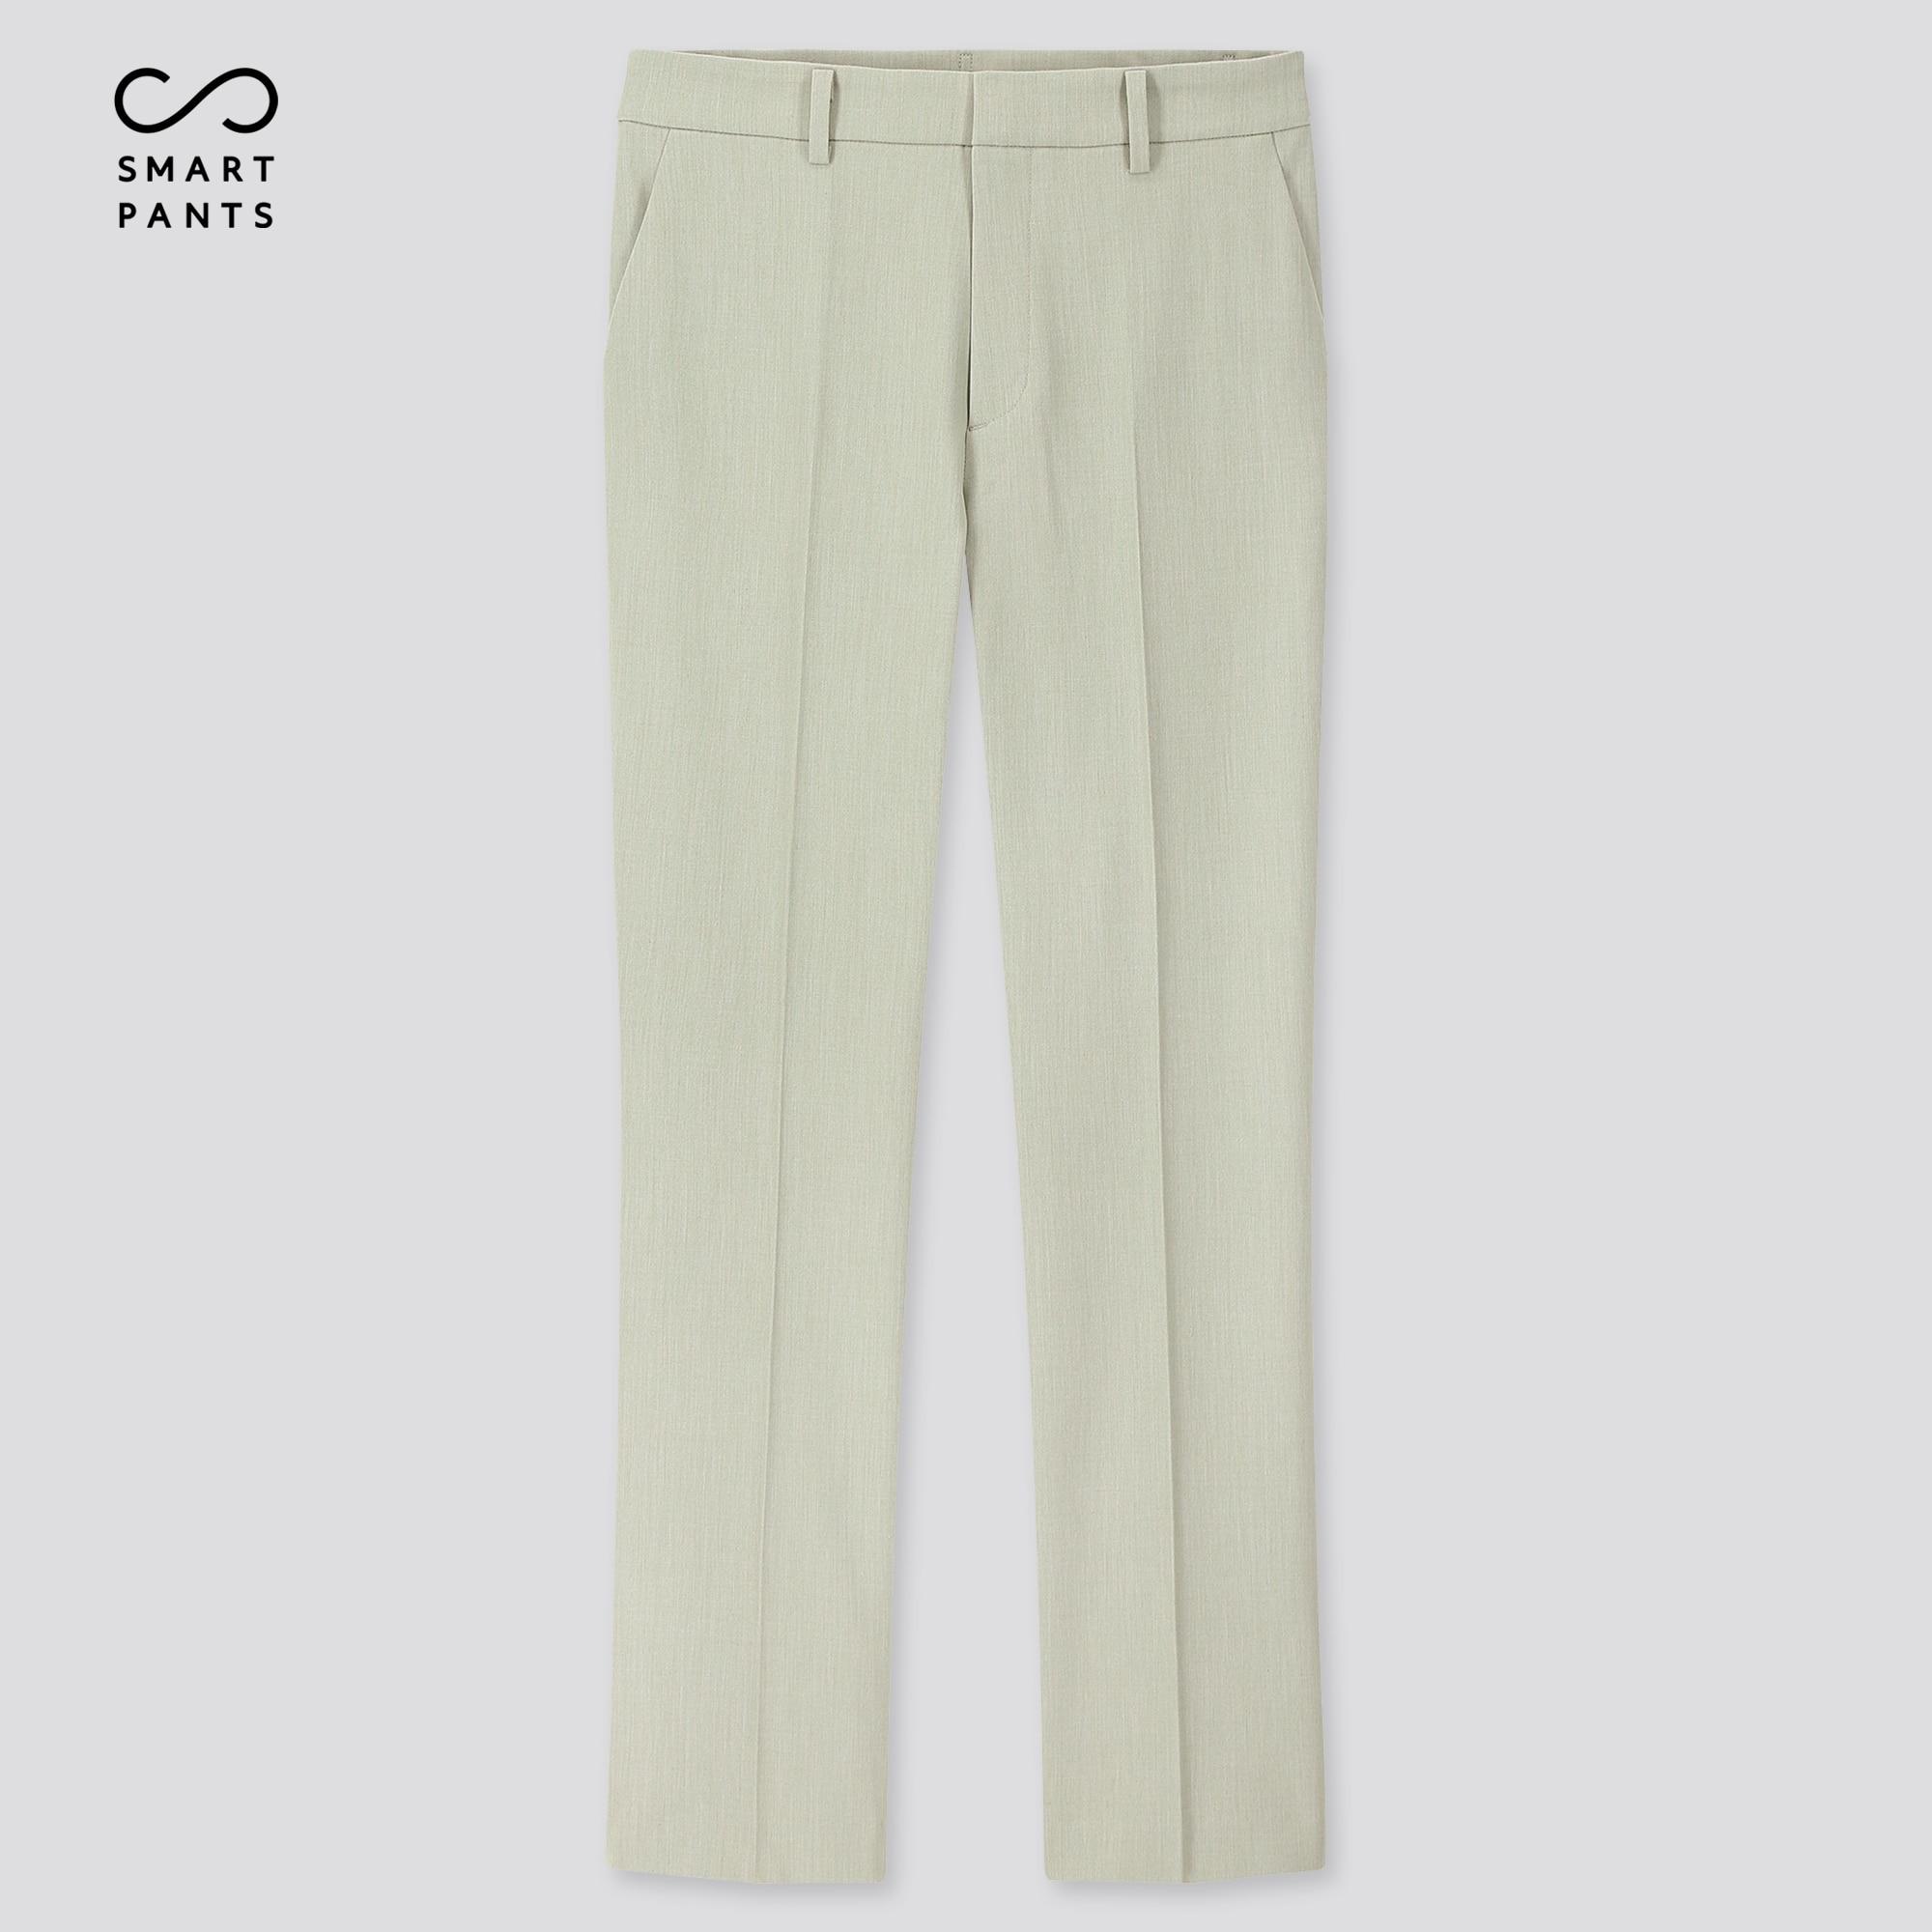 Women's Pants: Casual, Dress, Active & More   UNIQLO US